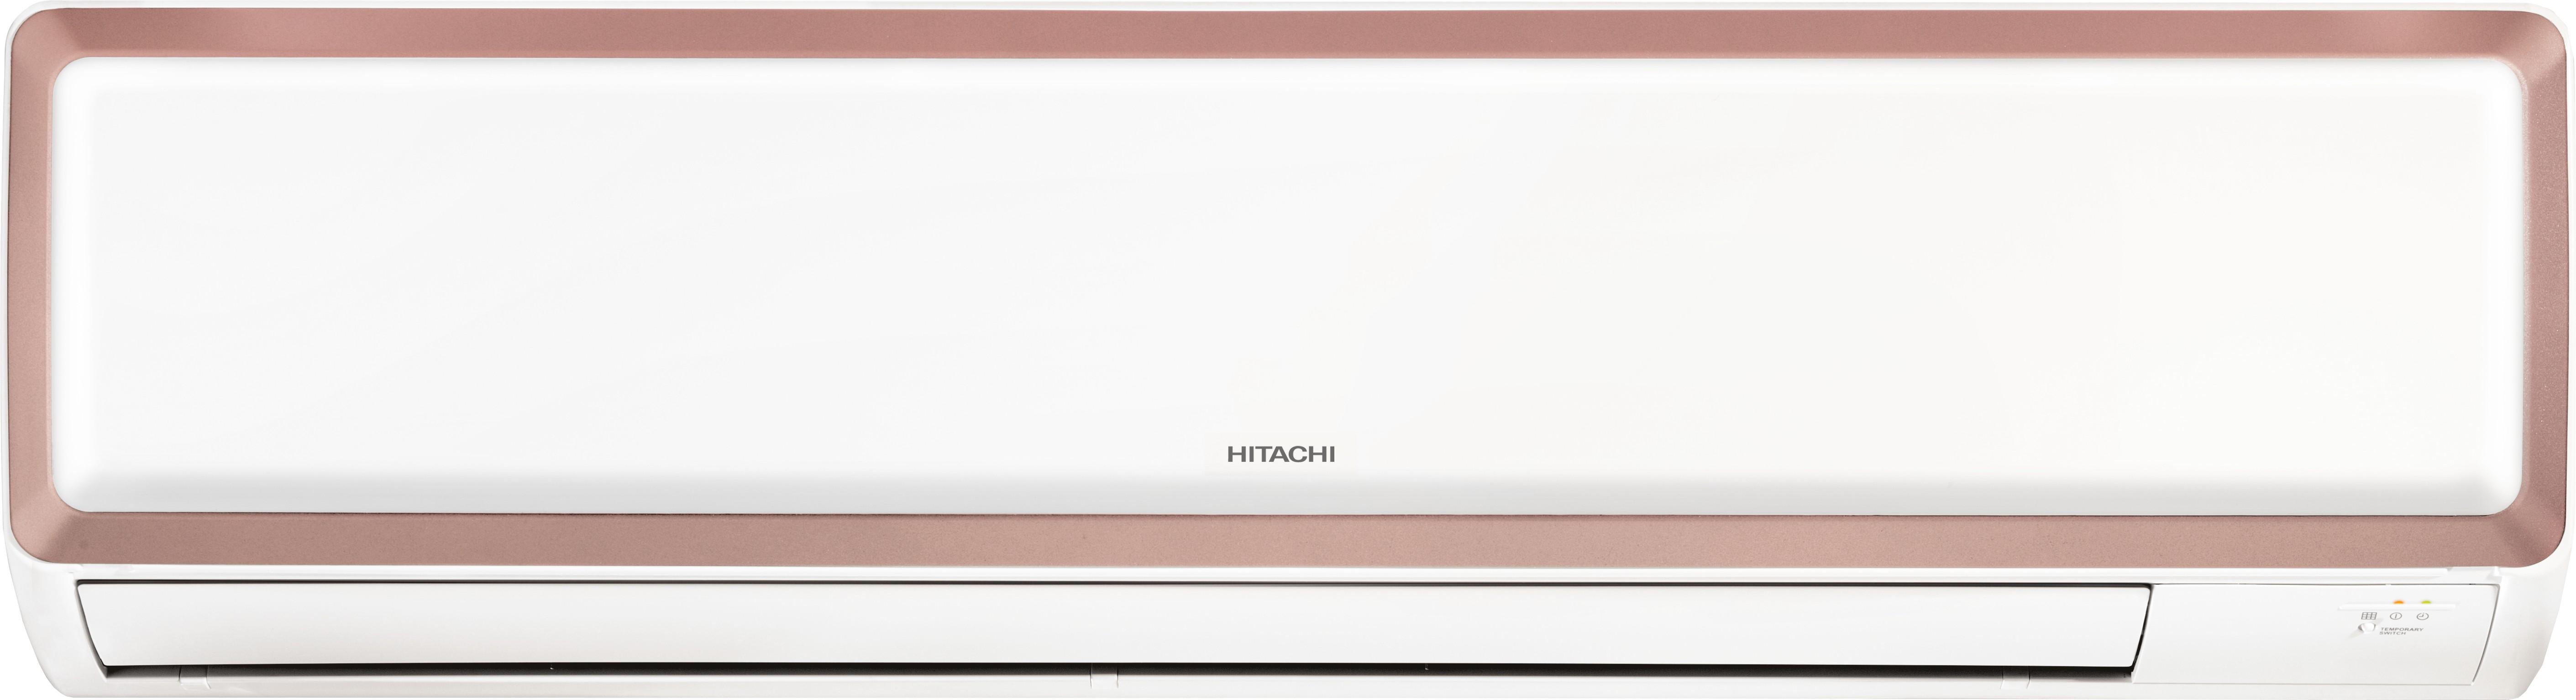 Hitachi 1.5 Tons 3 Star Split AC Copper (Hitachi)  Buy Online